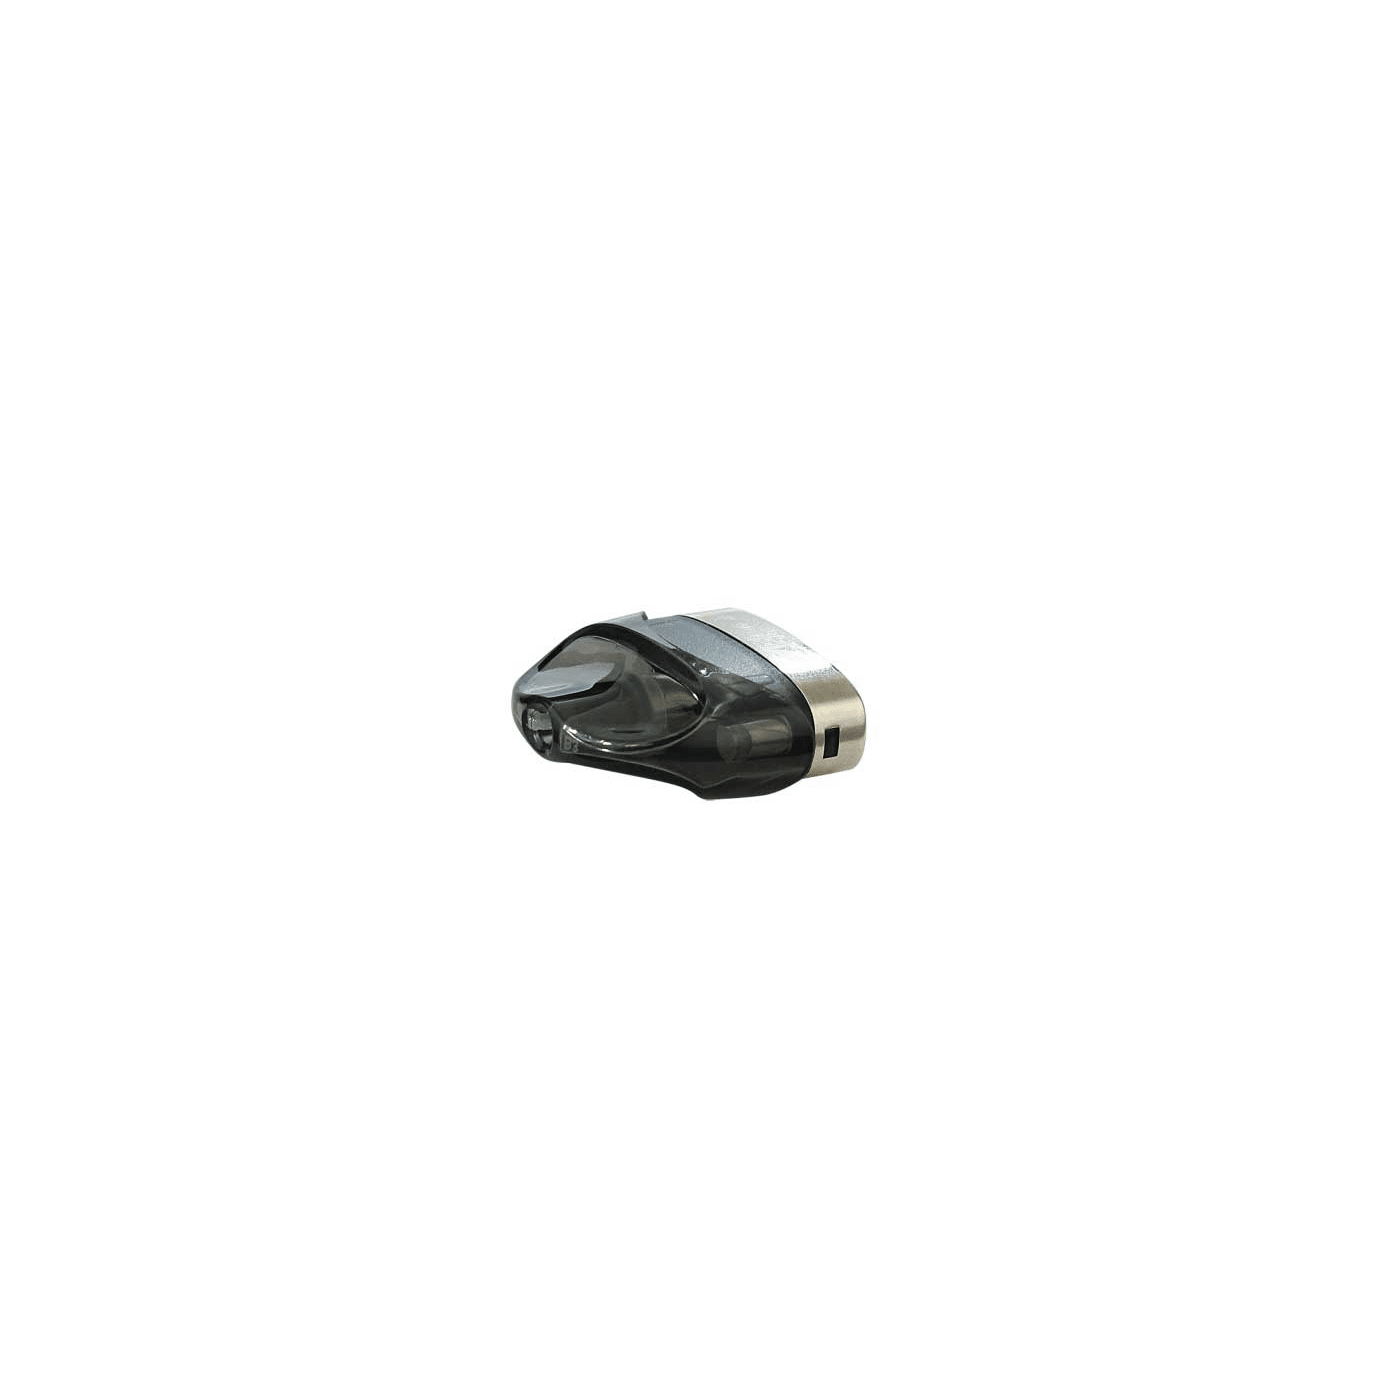 Renova Zero Refillable Pod - 2 Pack